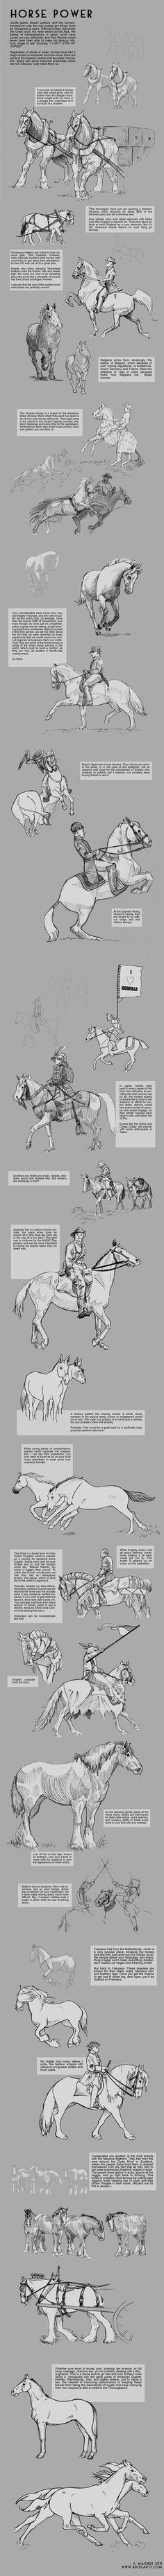 Horse Power Tutorial by sketcherjak.deviantart.com on @deviantART